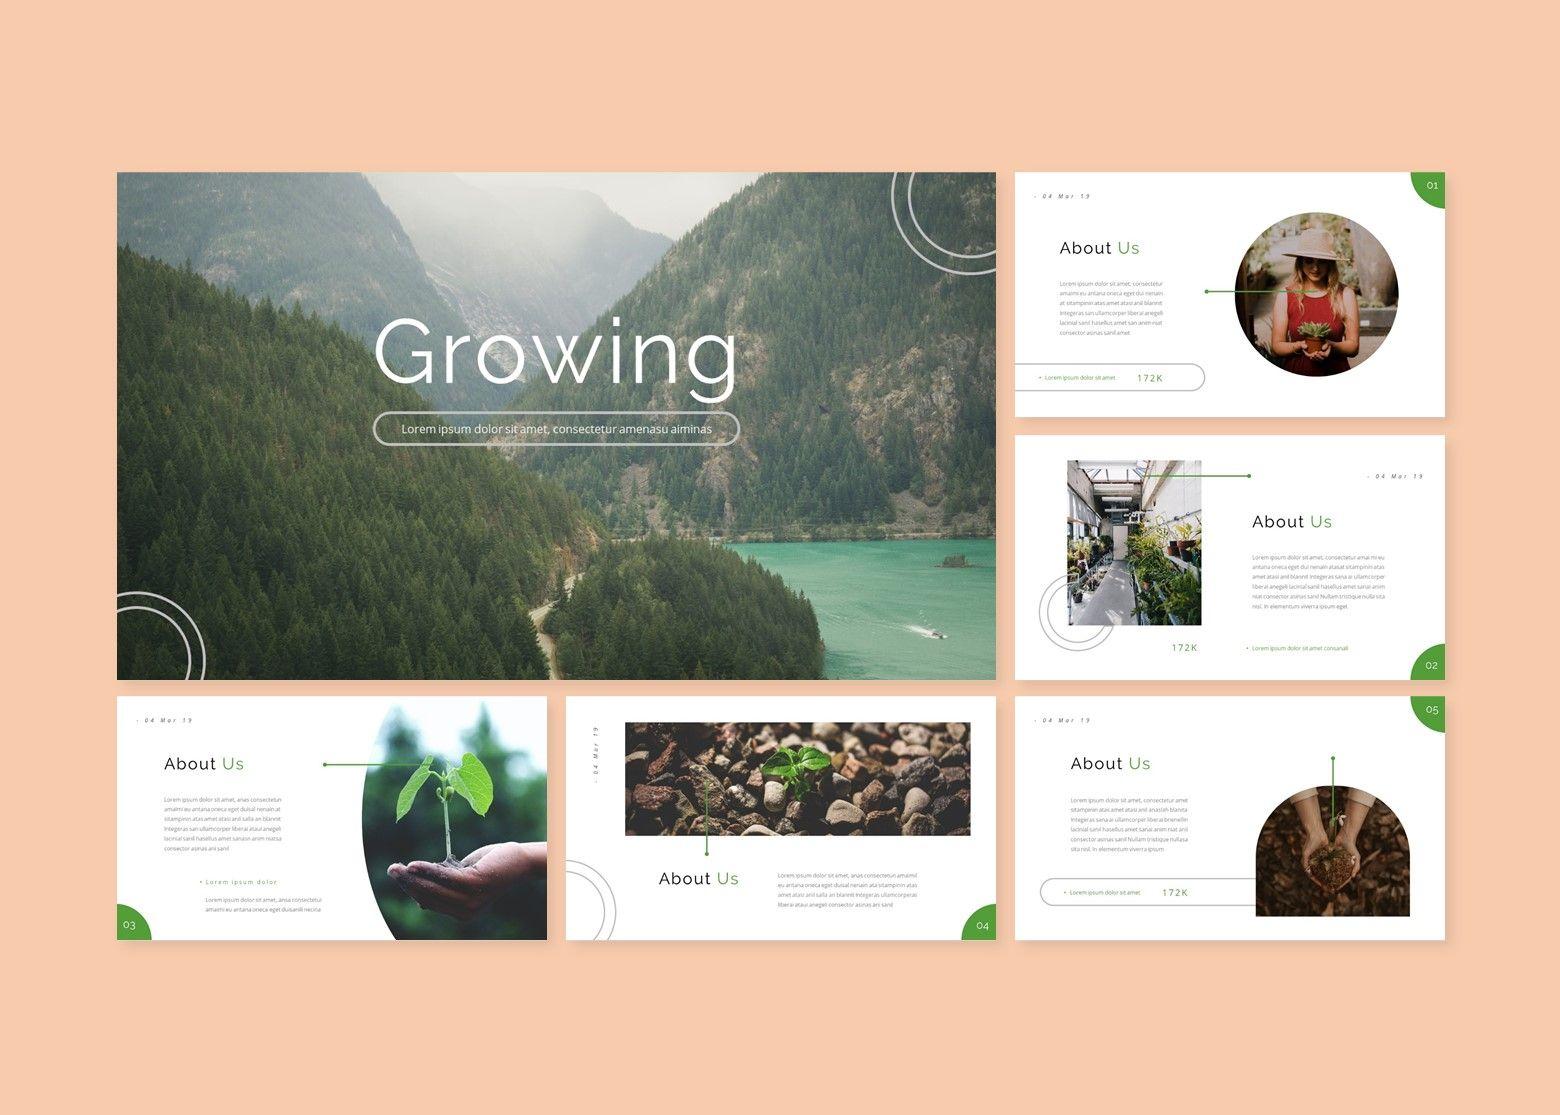 Growi Business Google Slides Template, Slide 2, 08127, Business Models — PoweredTemplate.com